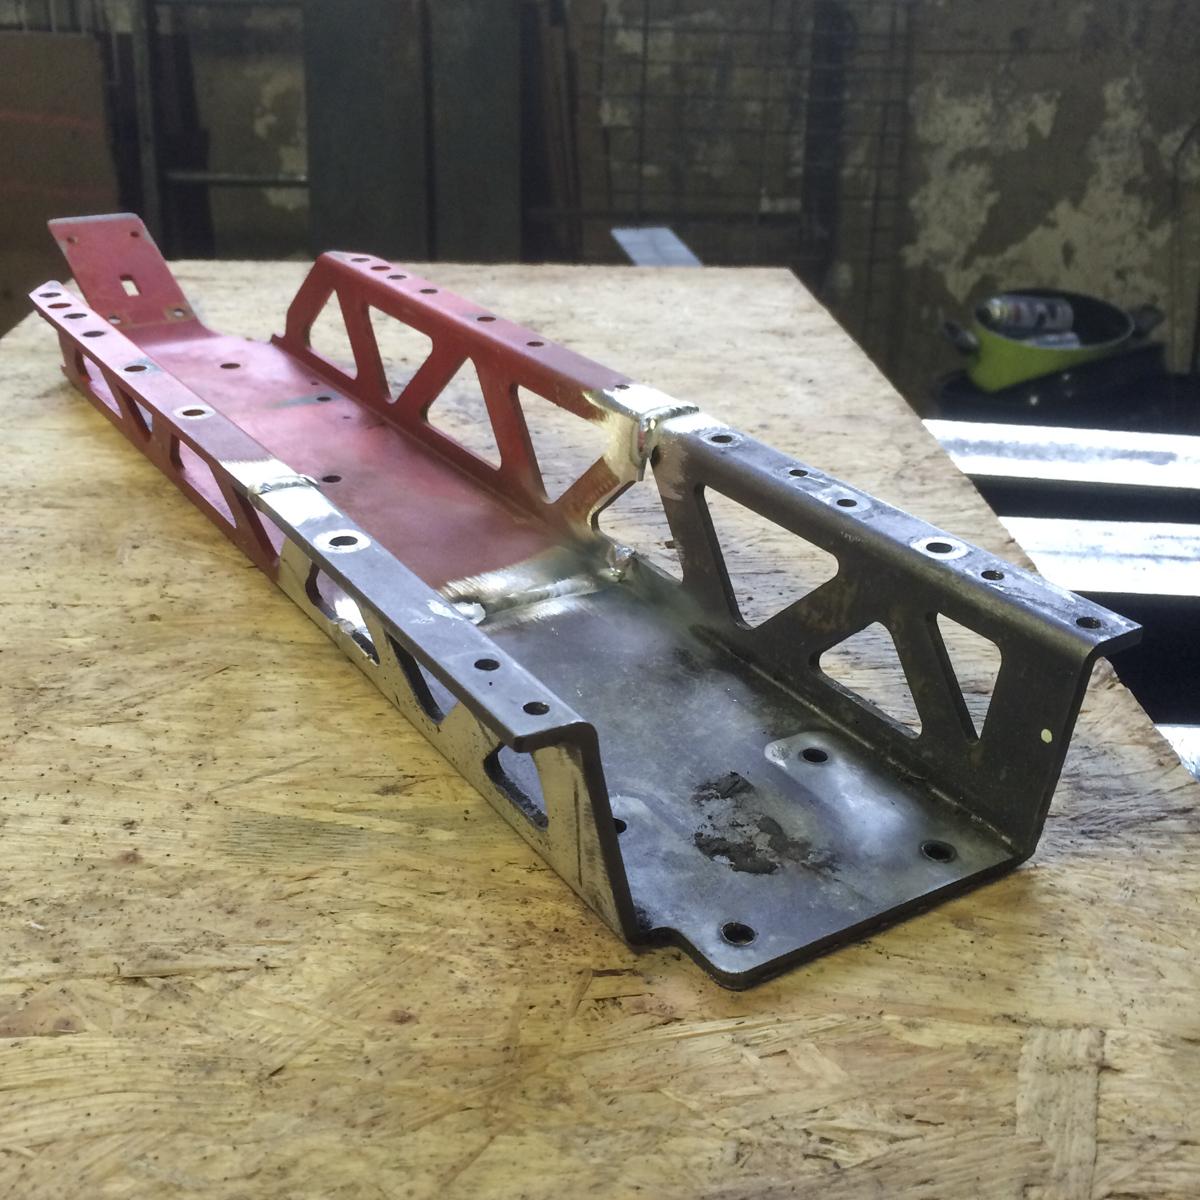 Metall Umbauten Rahmenverlängerung Aluminium benzinbetriebenes Kleinauto